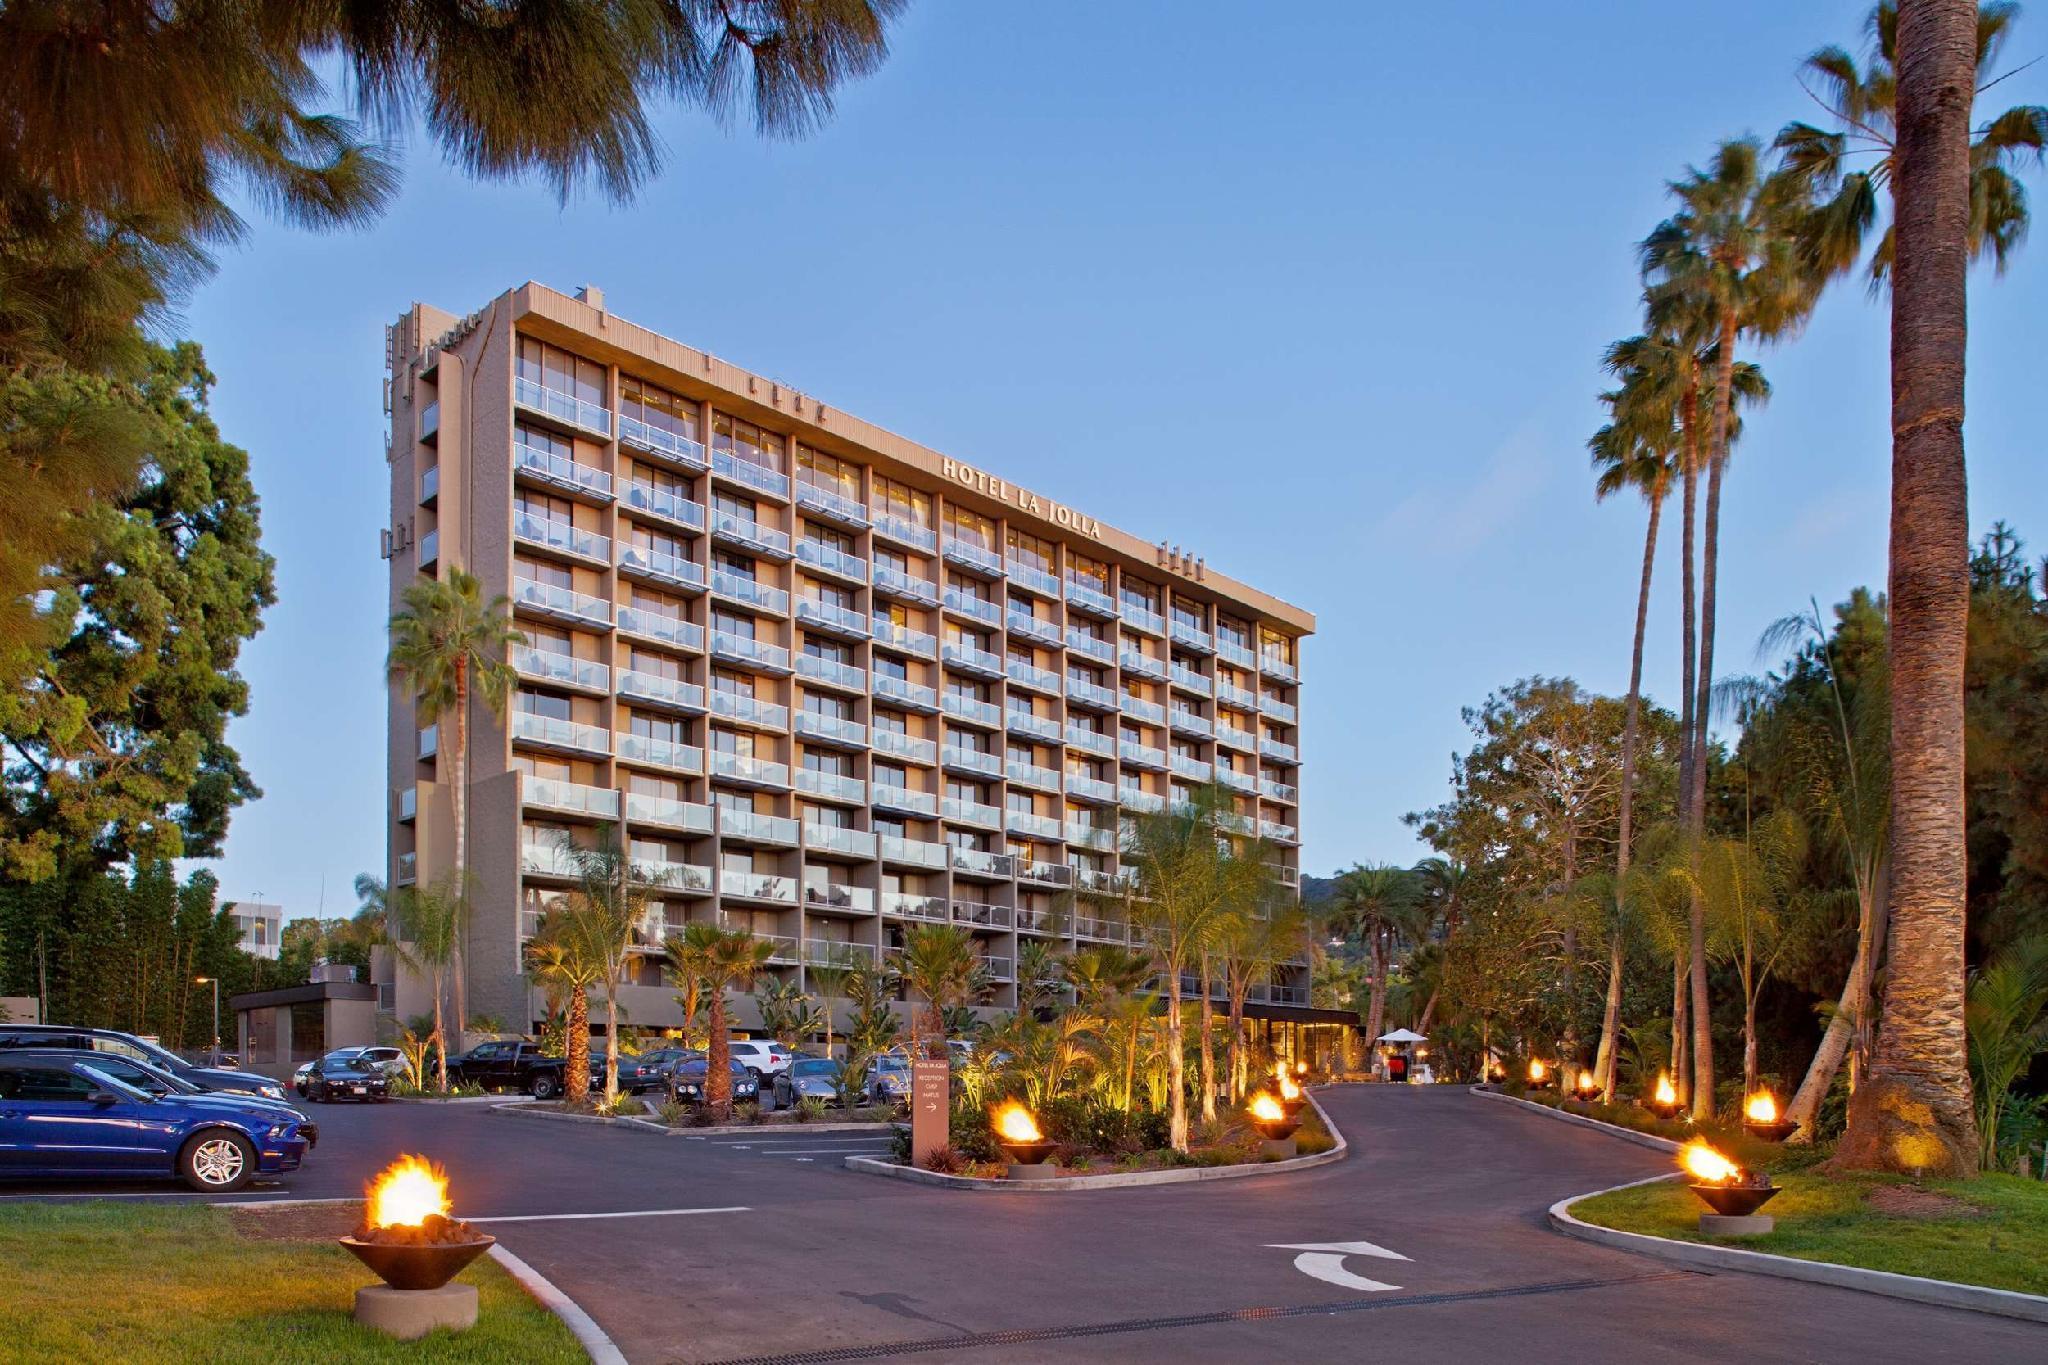 Hotel La Jolla Curio Collection By Hilton